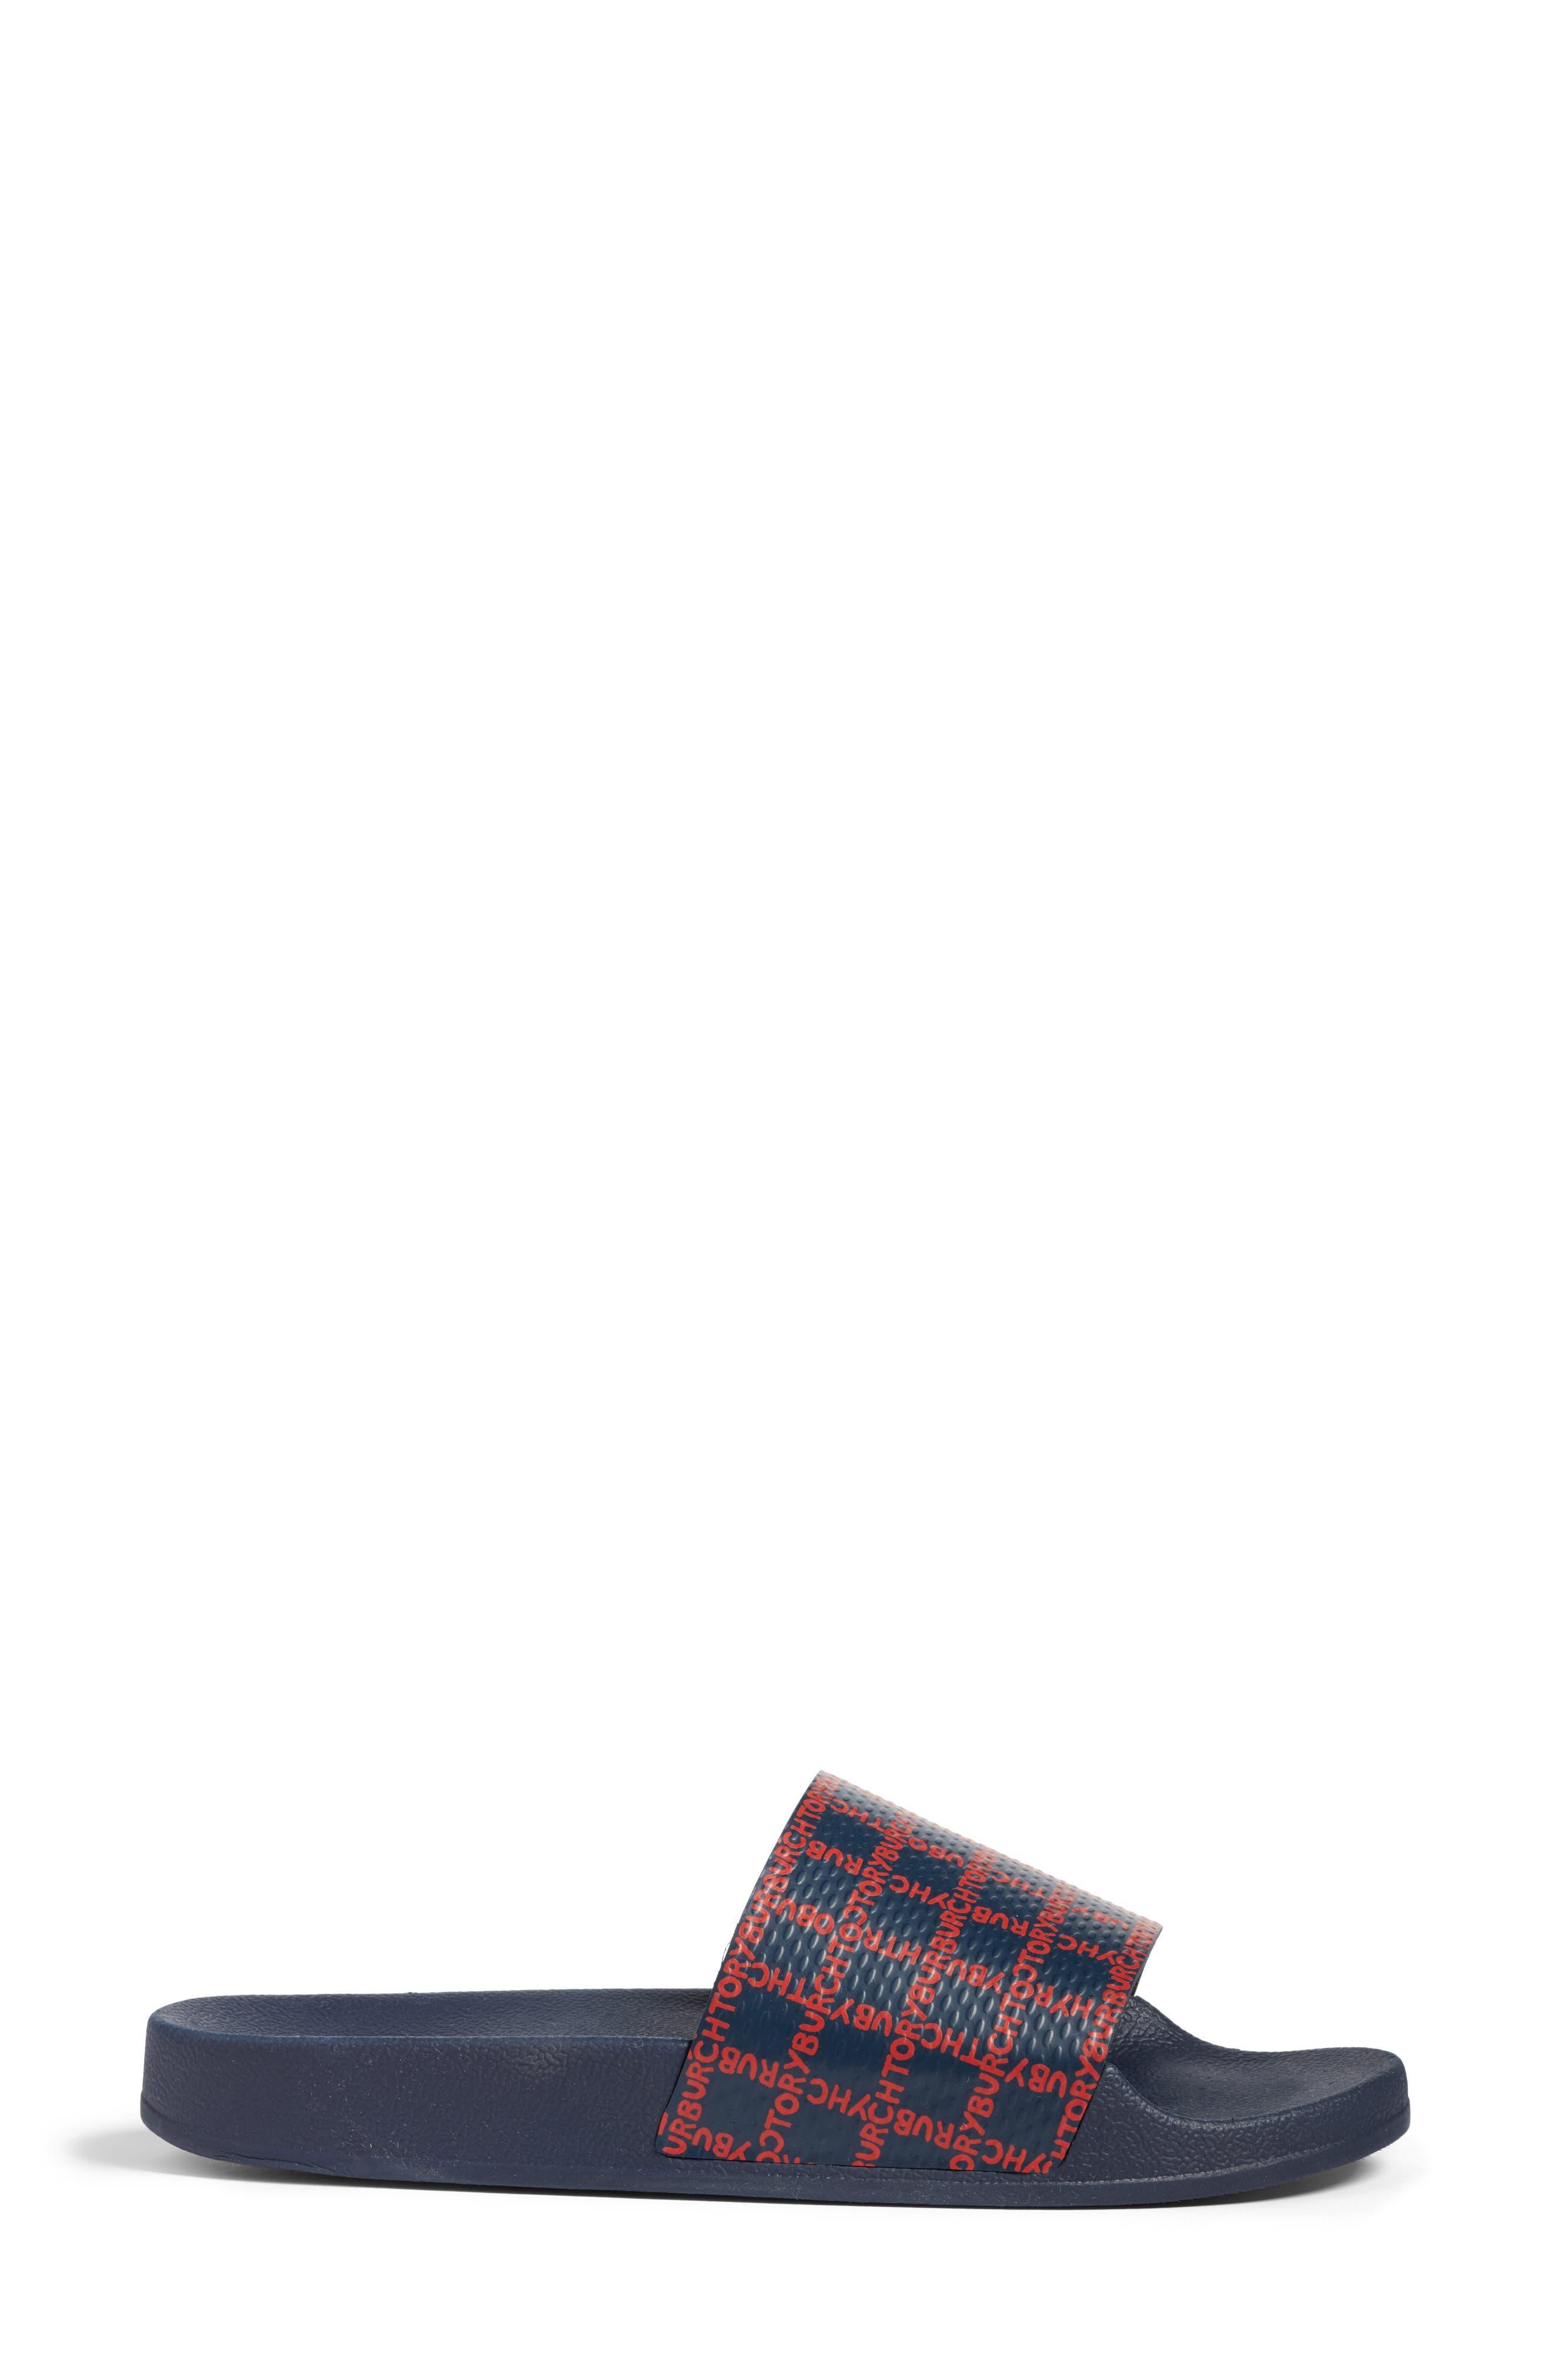 Stormy Slide Sandal,                             Alternate thumbnail 3, color,                             Tory Navy/ Tory Red